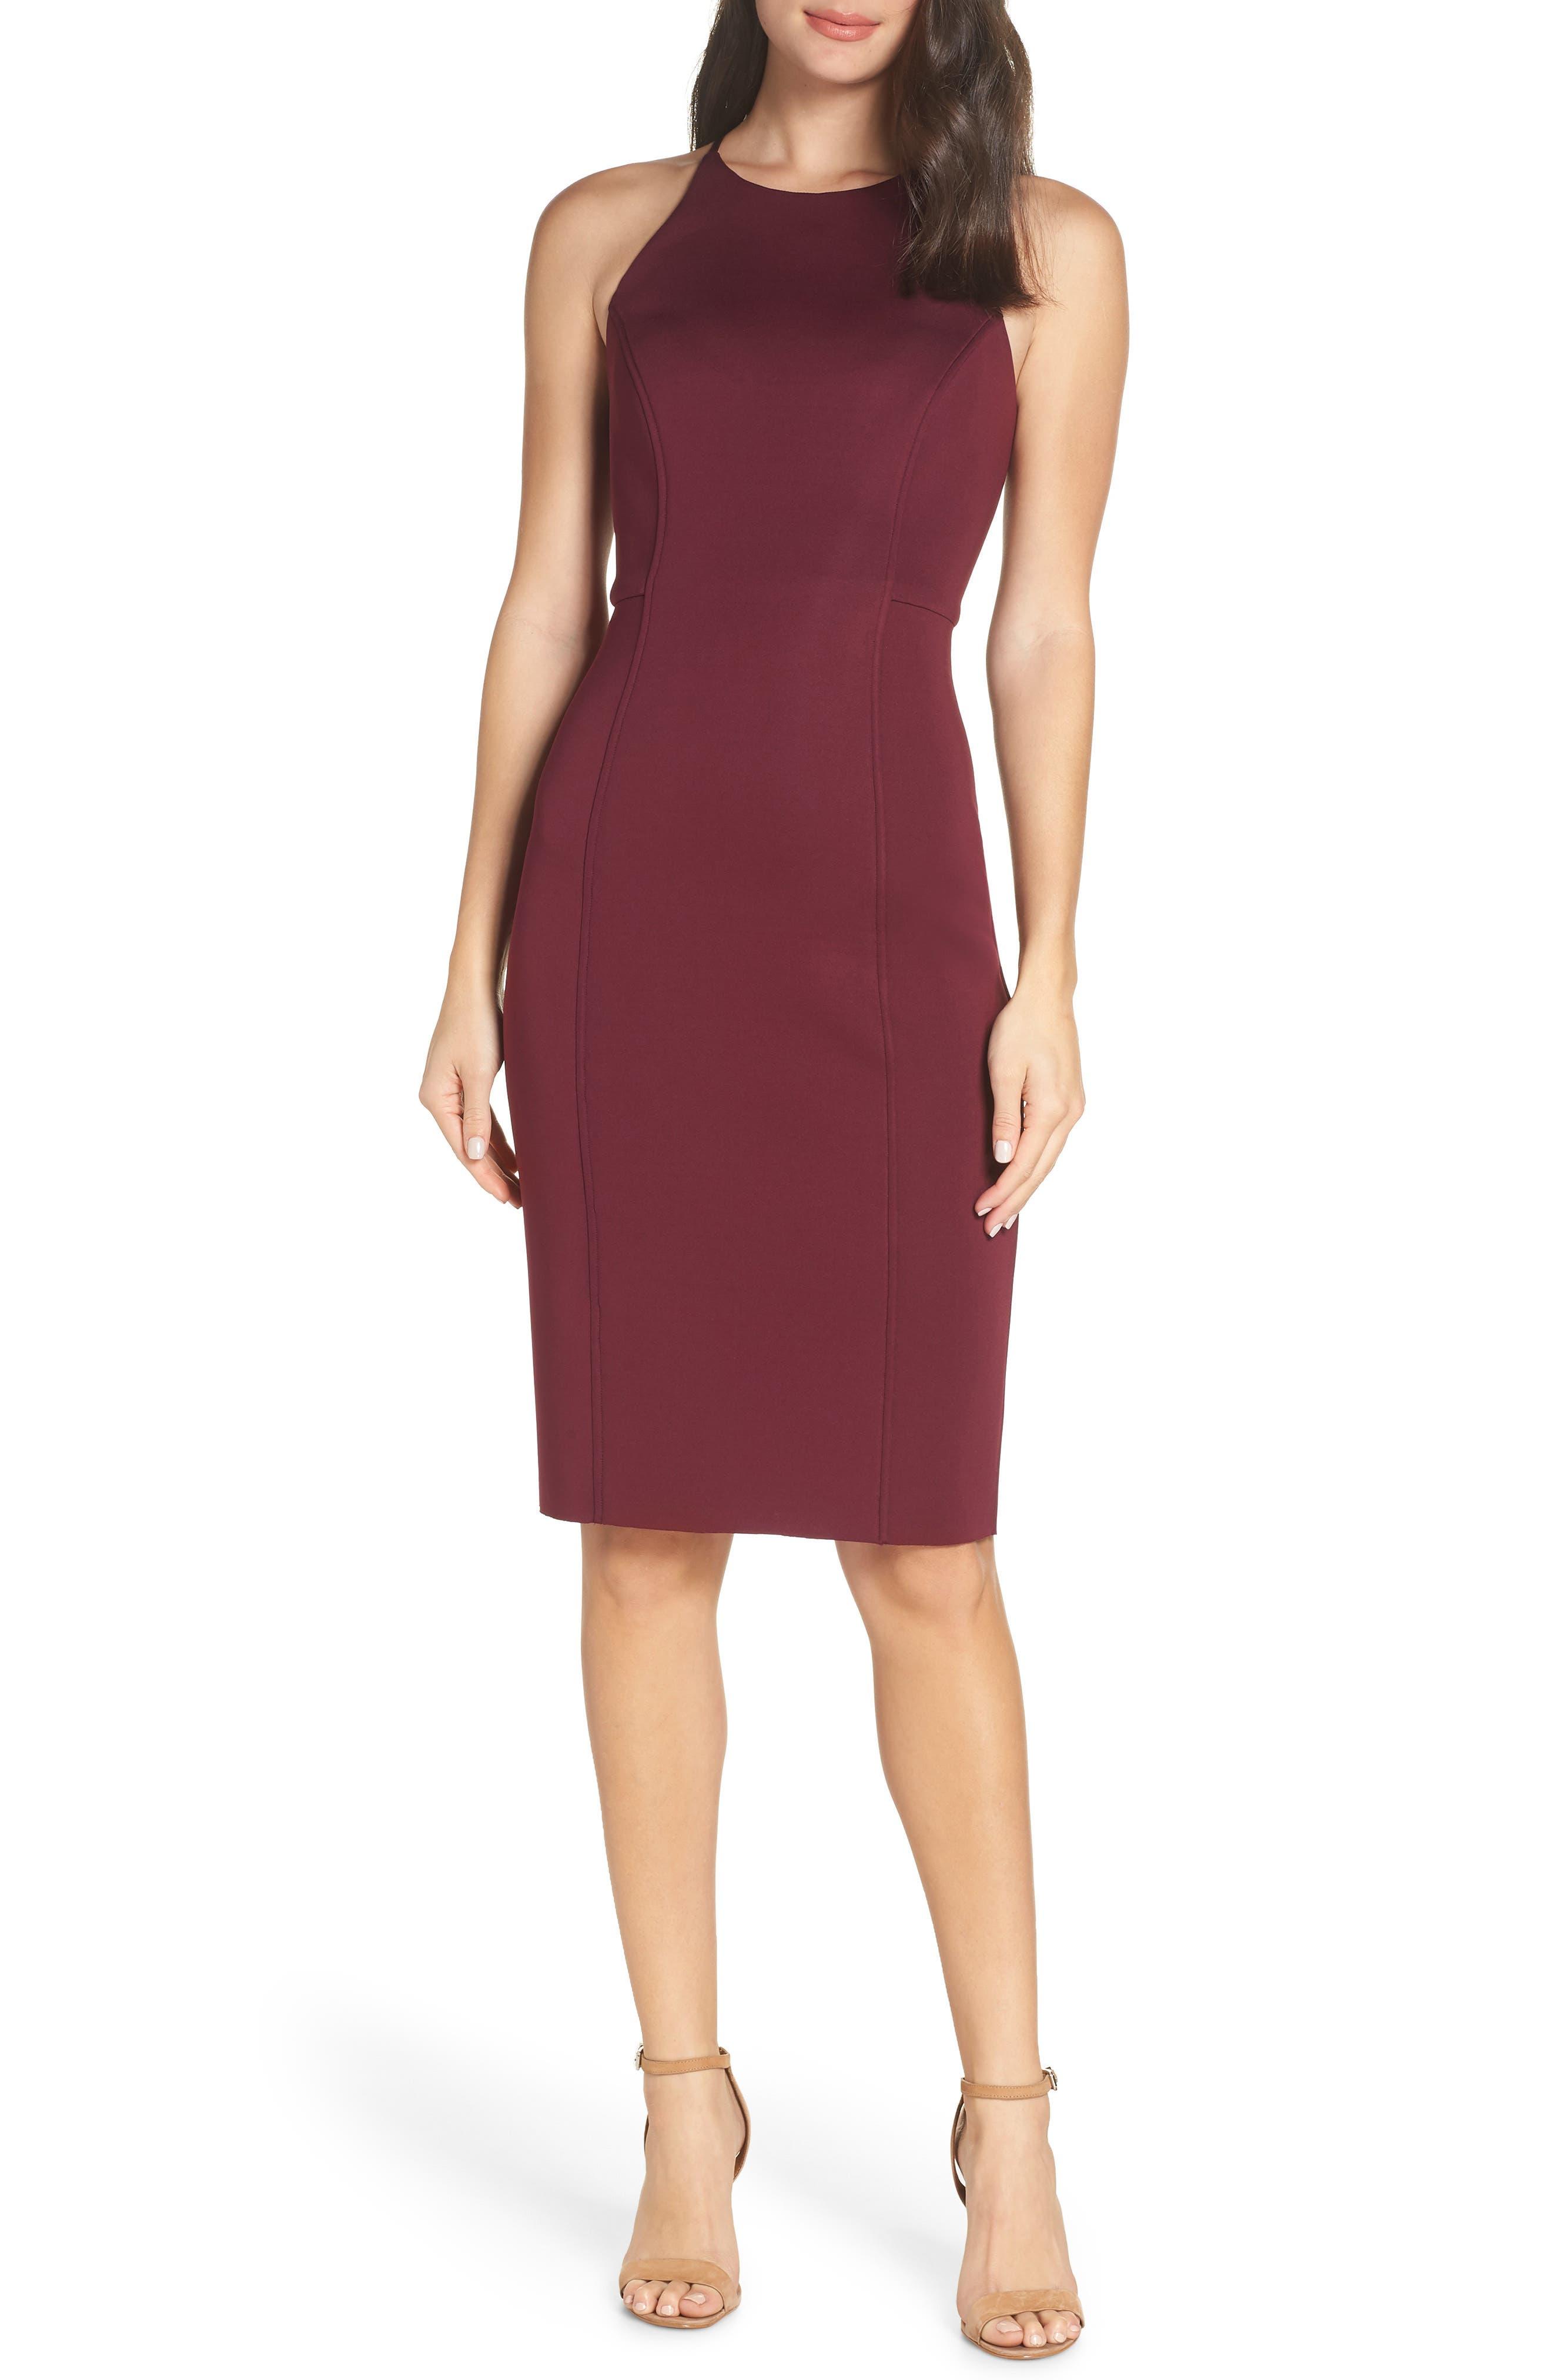 CHELSEA28 Scuba Sheath Dress, Main, color, 930